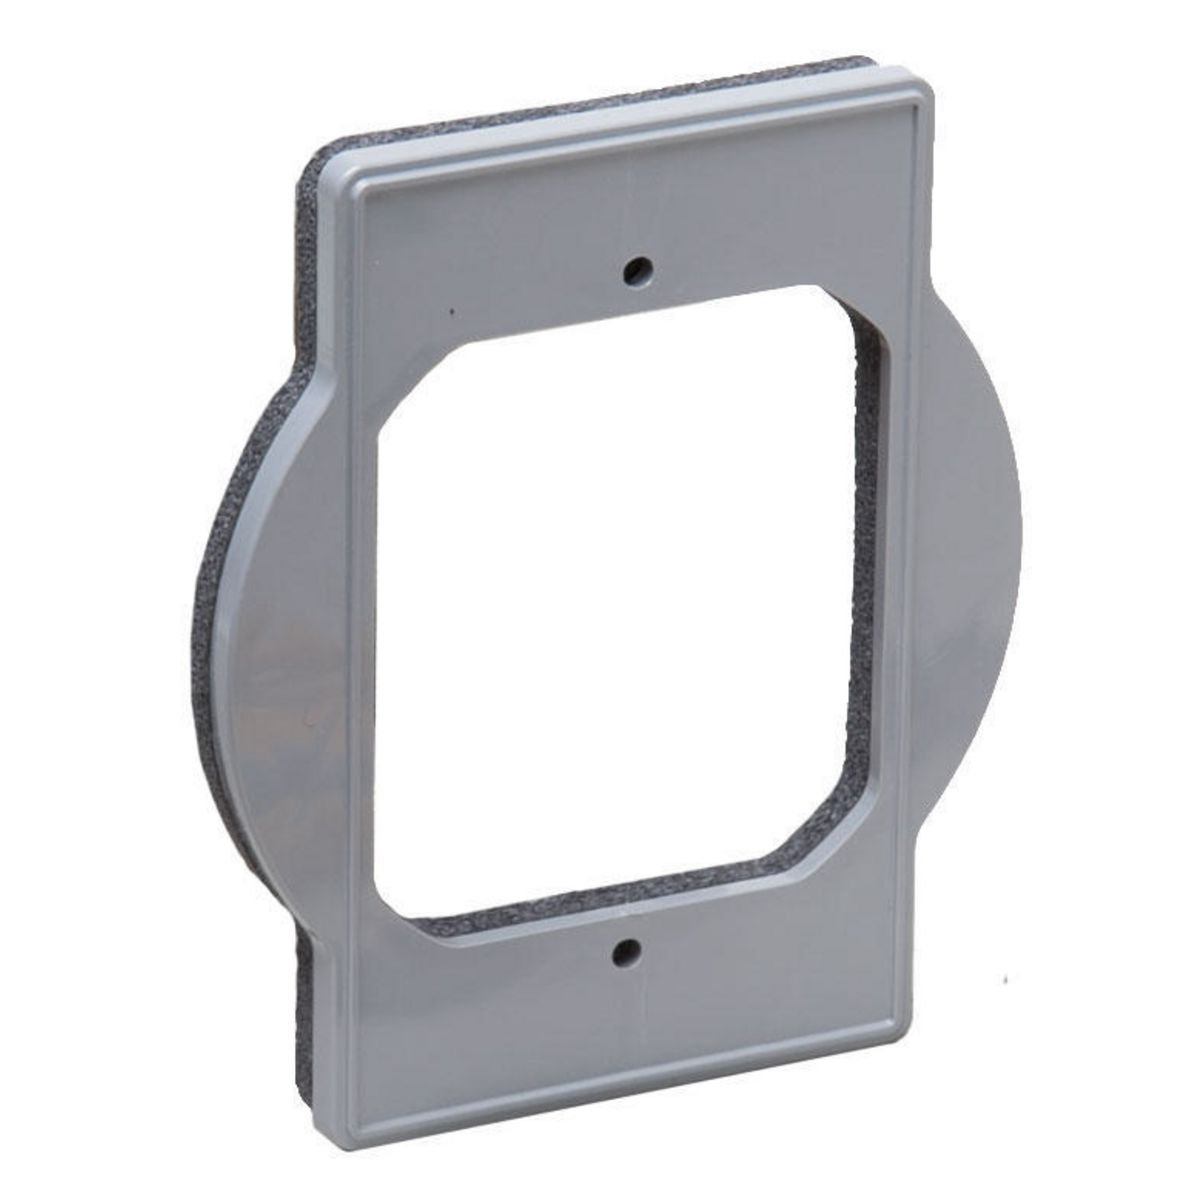 TayMac PRBA400G Plastic Round Box Adapter